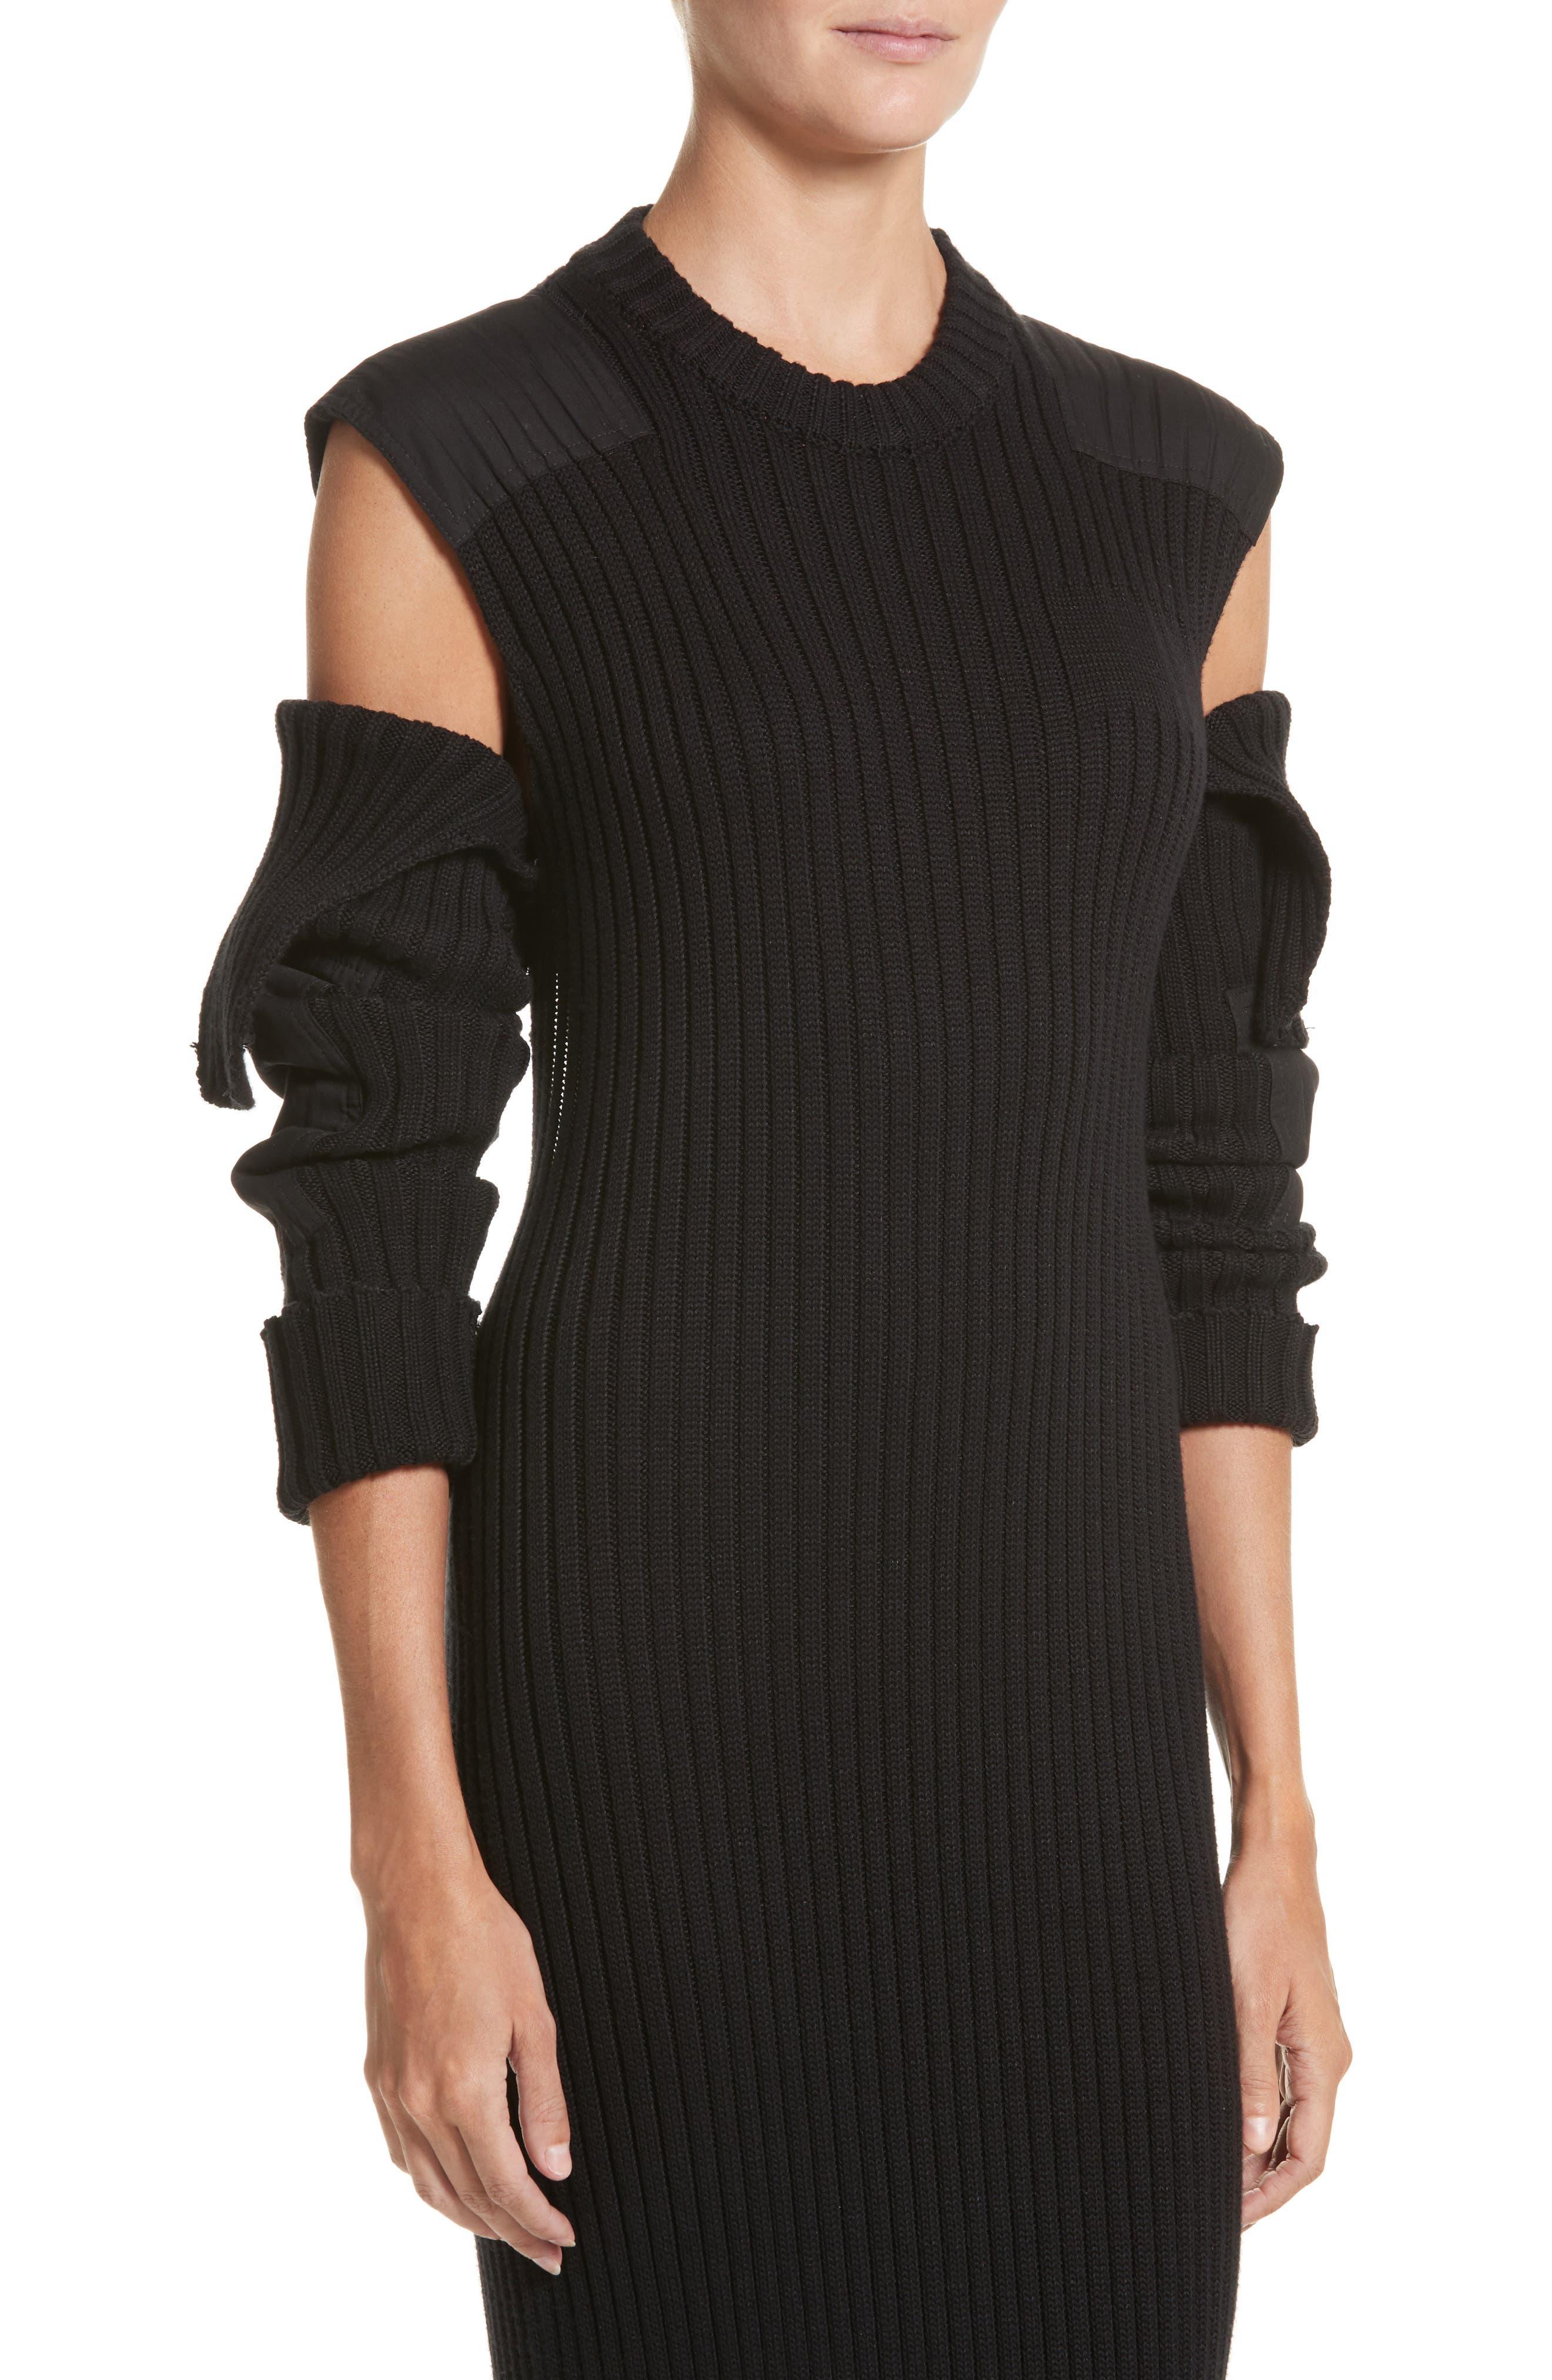 Rib Knit Cold Shoulder Dress,                             Alternate thumbnail 4, color,                             Black